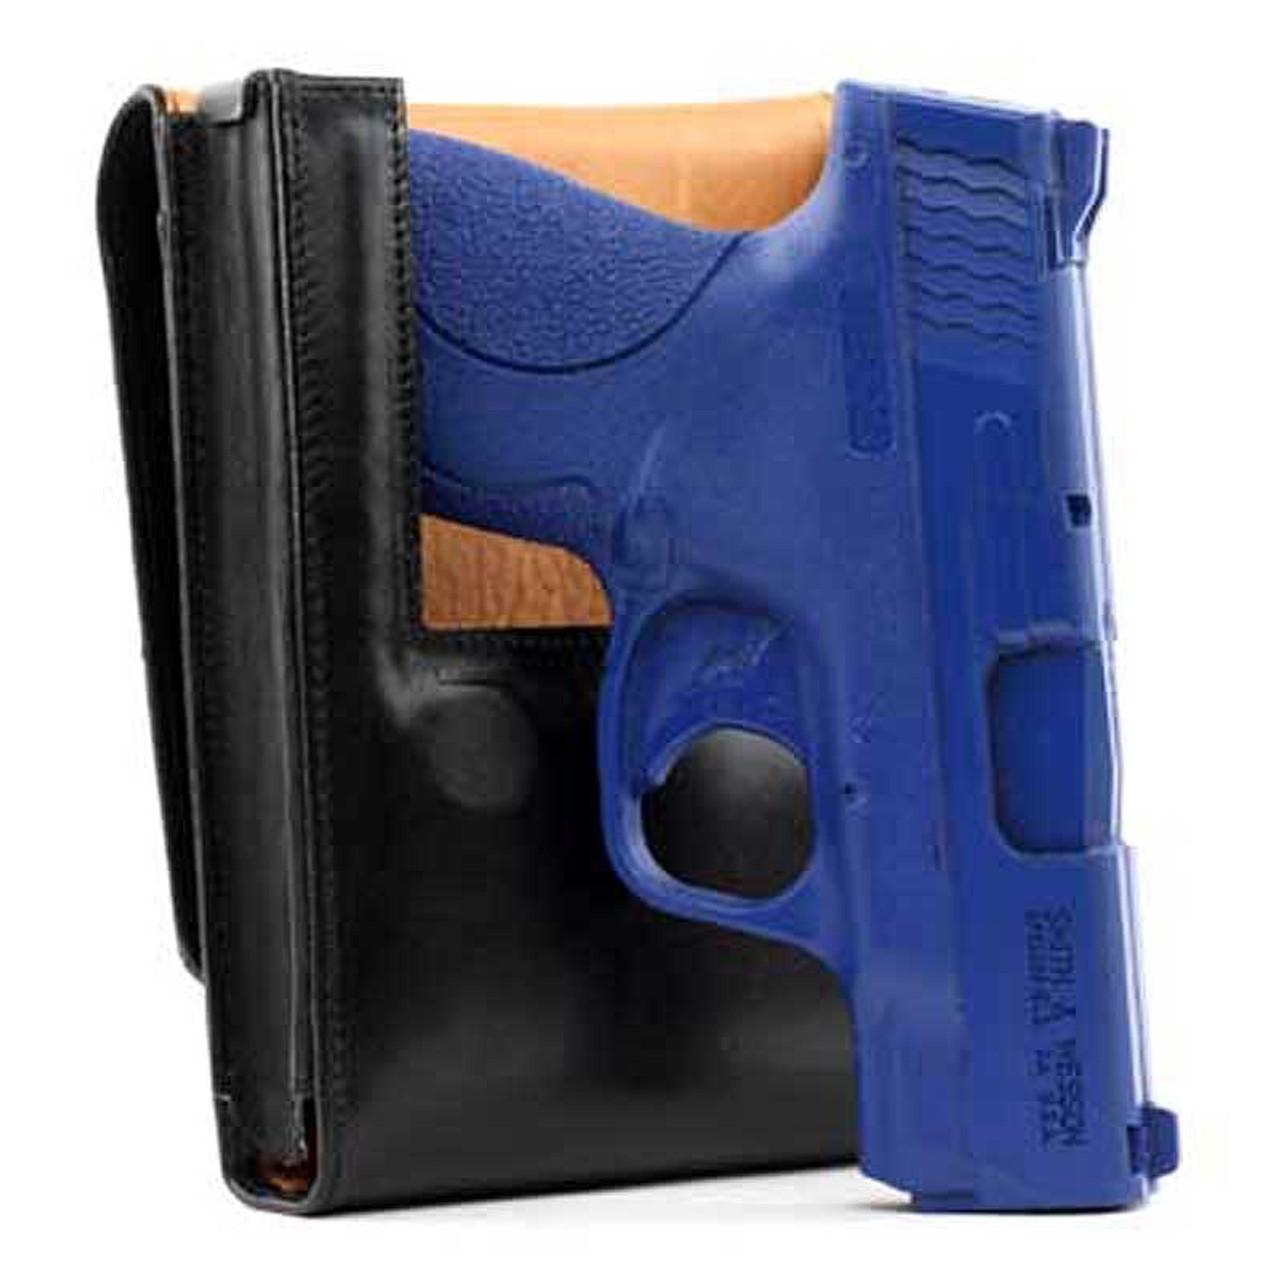 M&P Shield 380 EZ Concealed Carry Holster (Belt Loop)